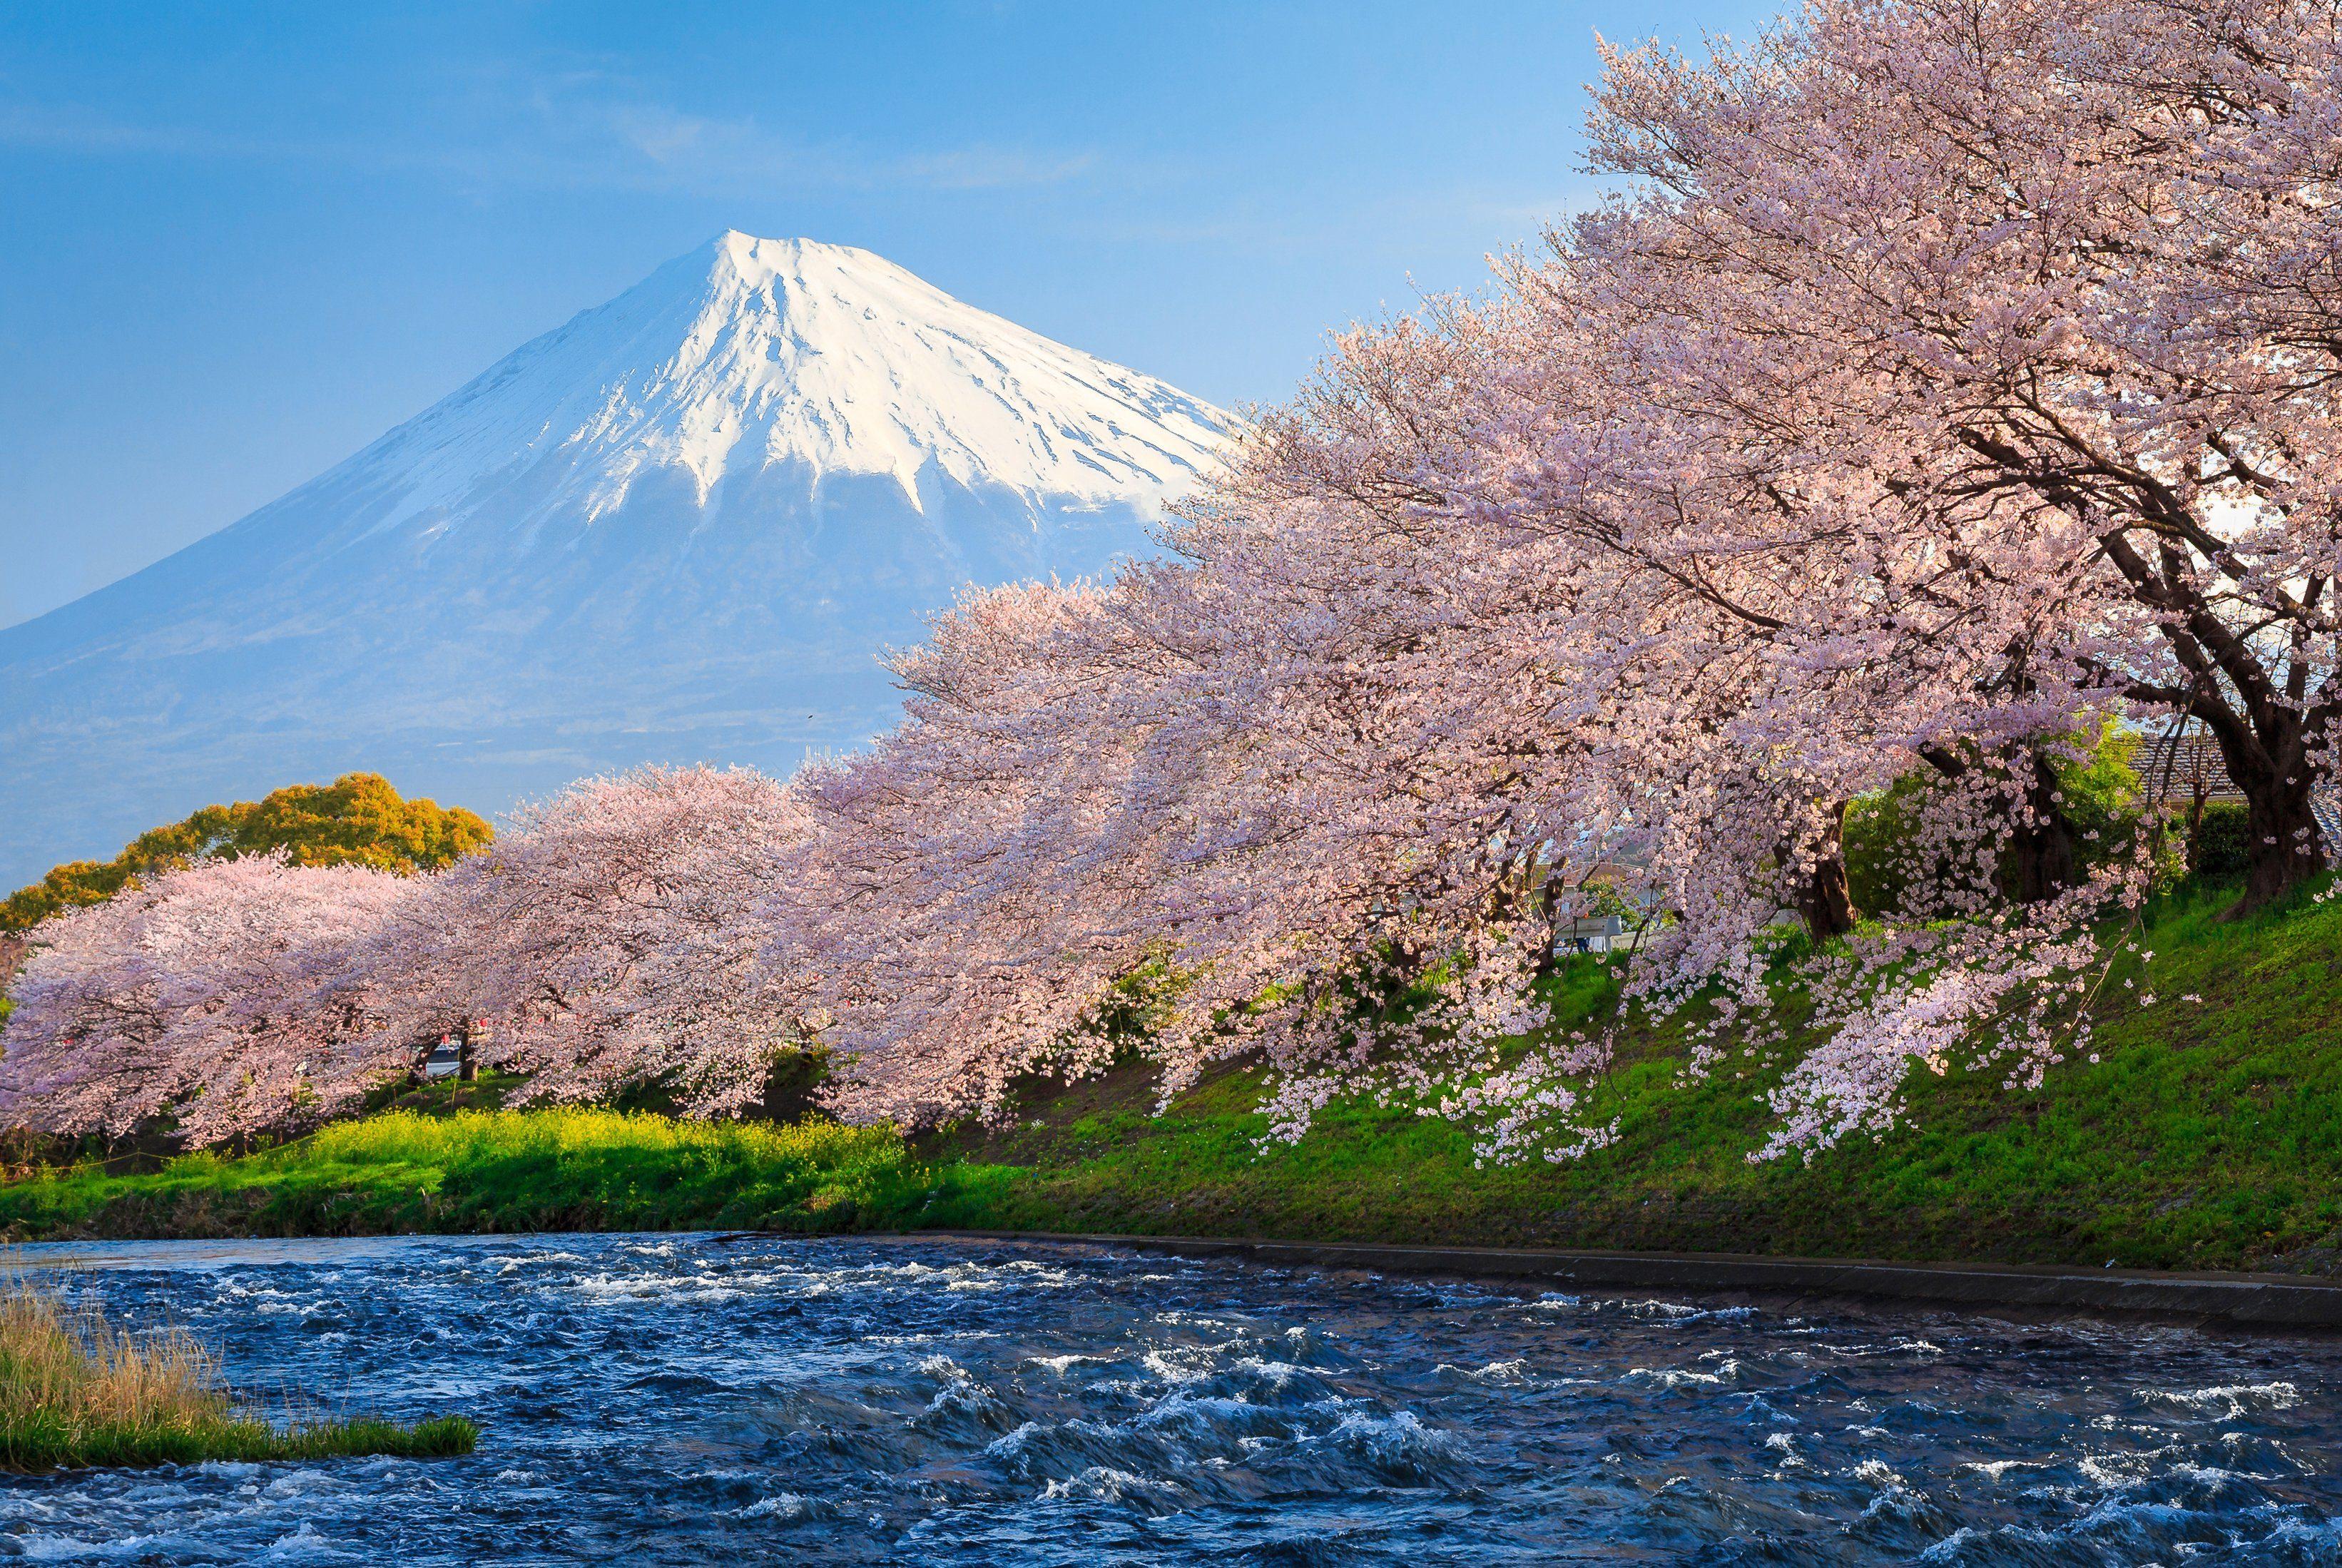 PAPERMOON Fototapete »Fuji and Sakura«, BlueBack, 7 Bahnen, 350 x 260 cm